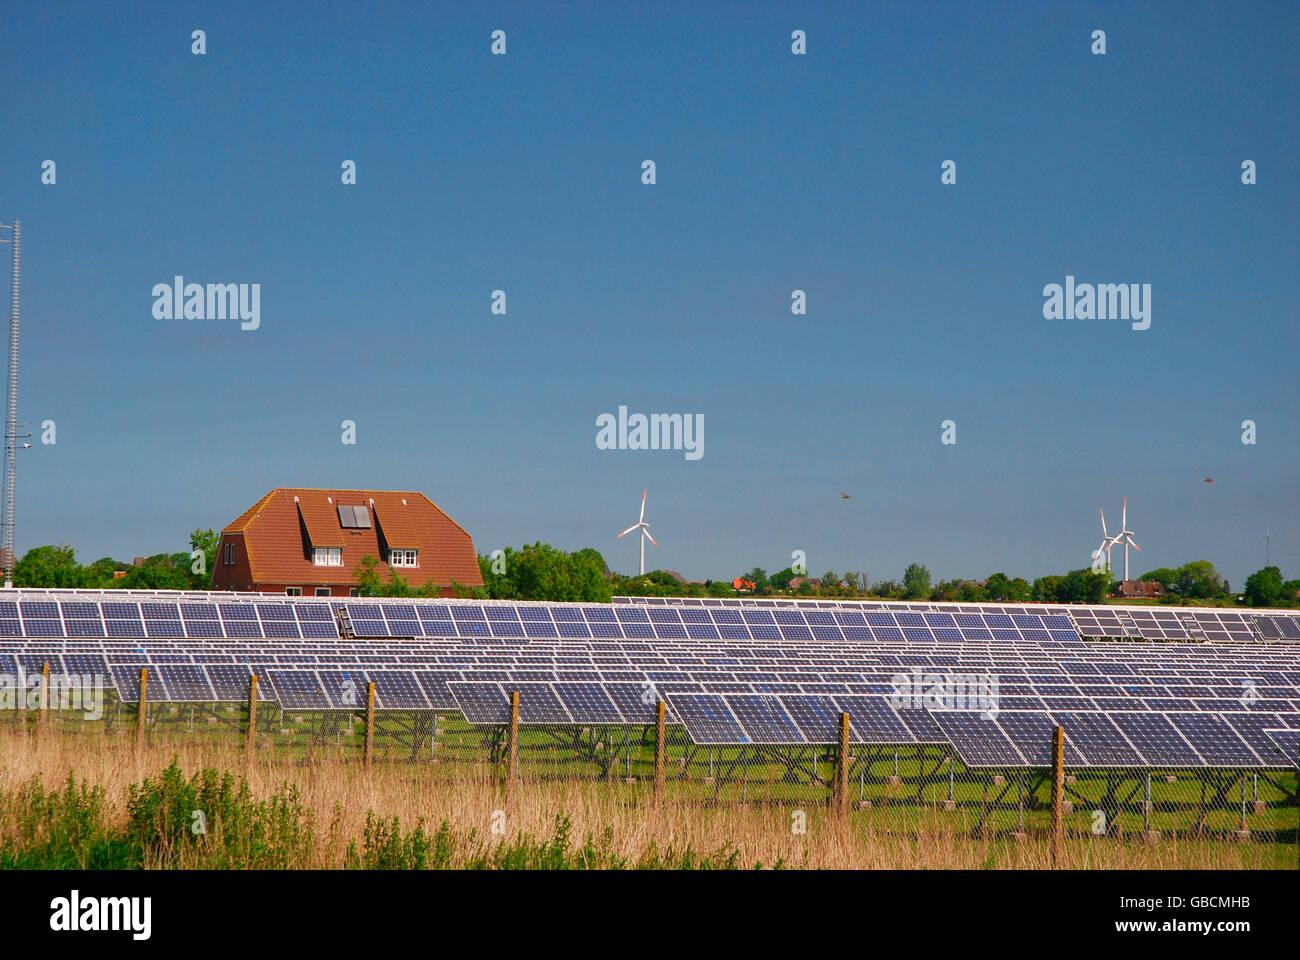 Energieanlage, alternative Energie, Energiegewinnung, Solar, Solarfeld - Stock Image